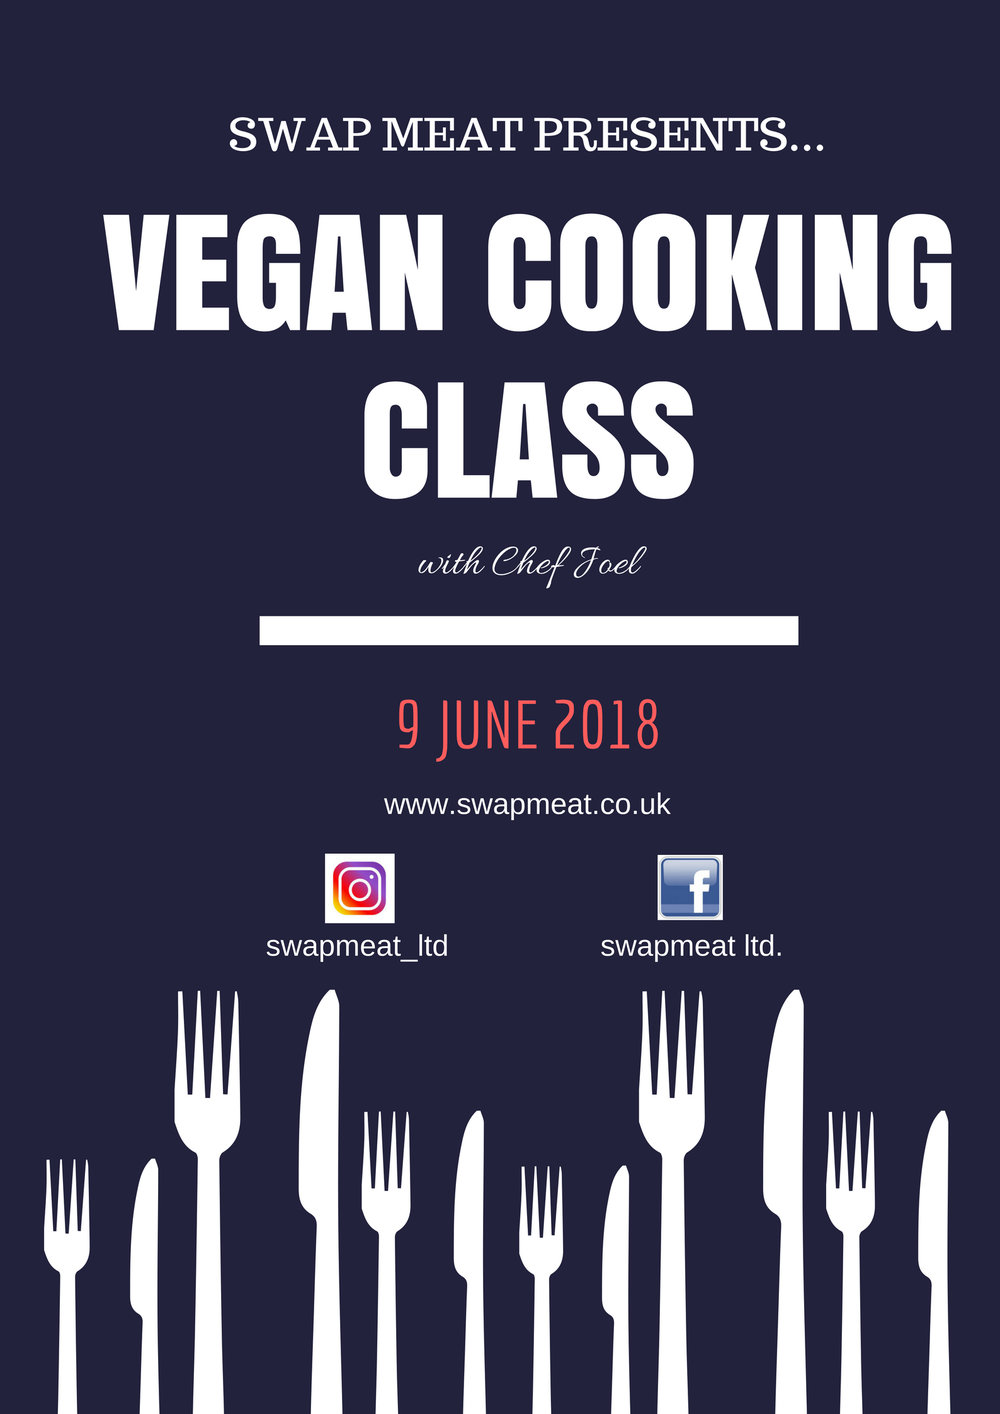 veganCooking class with chef joel.jpg